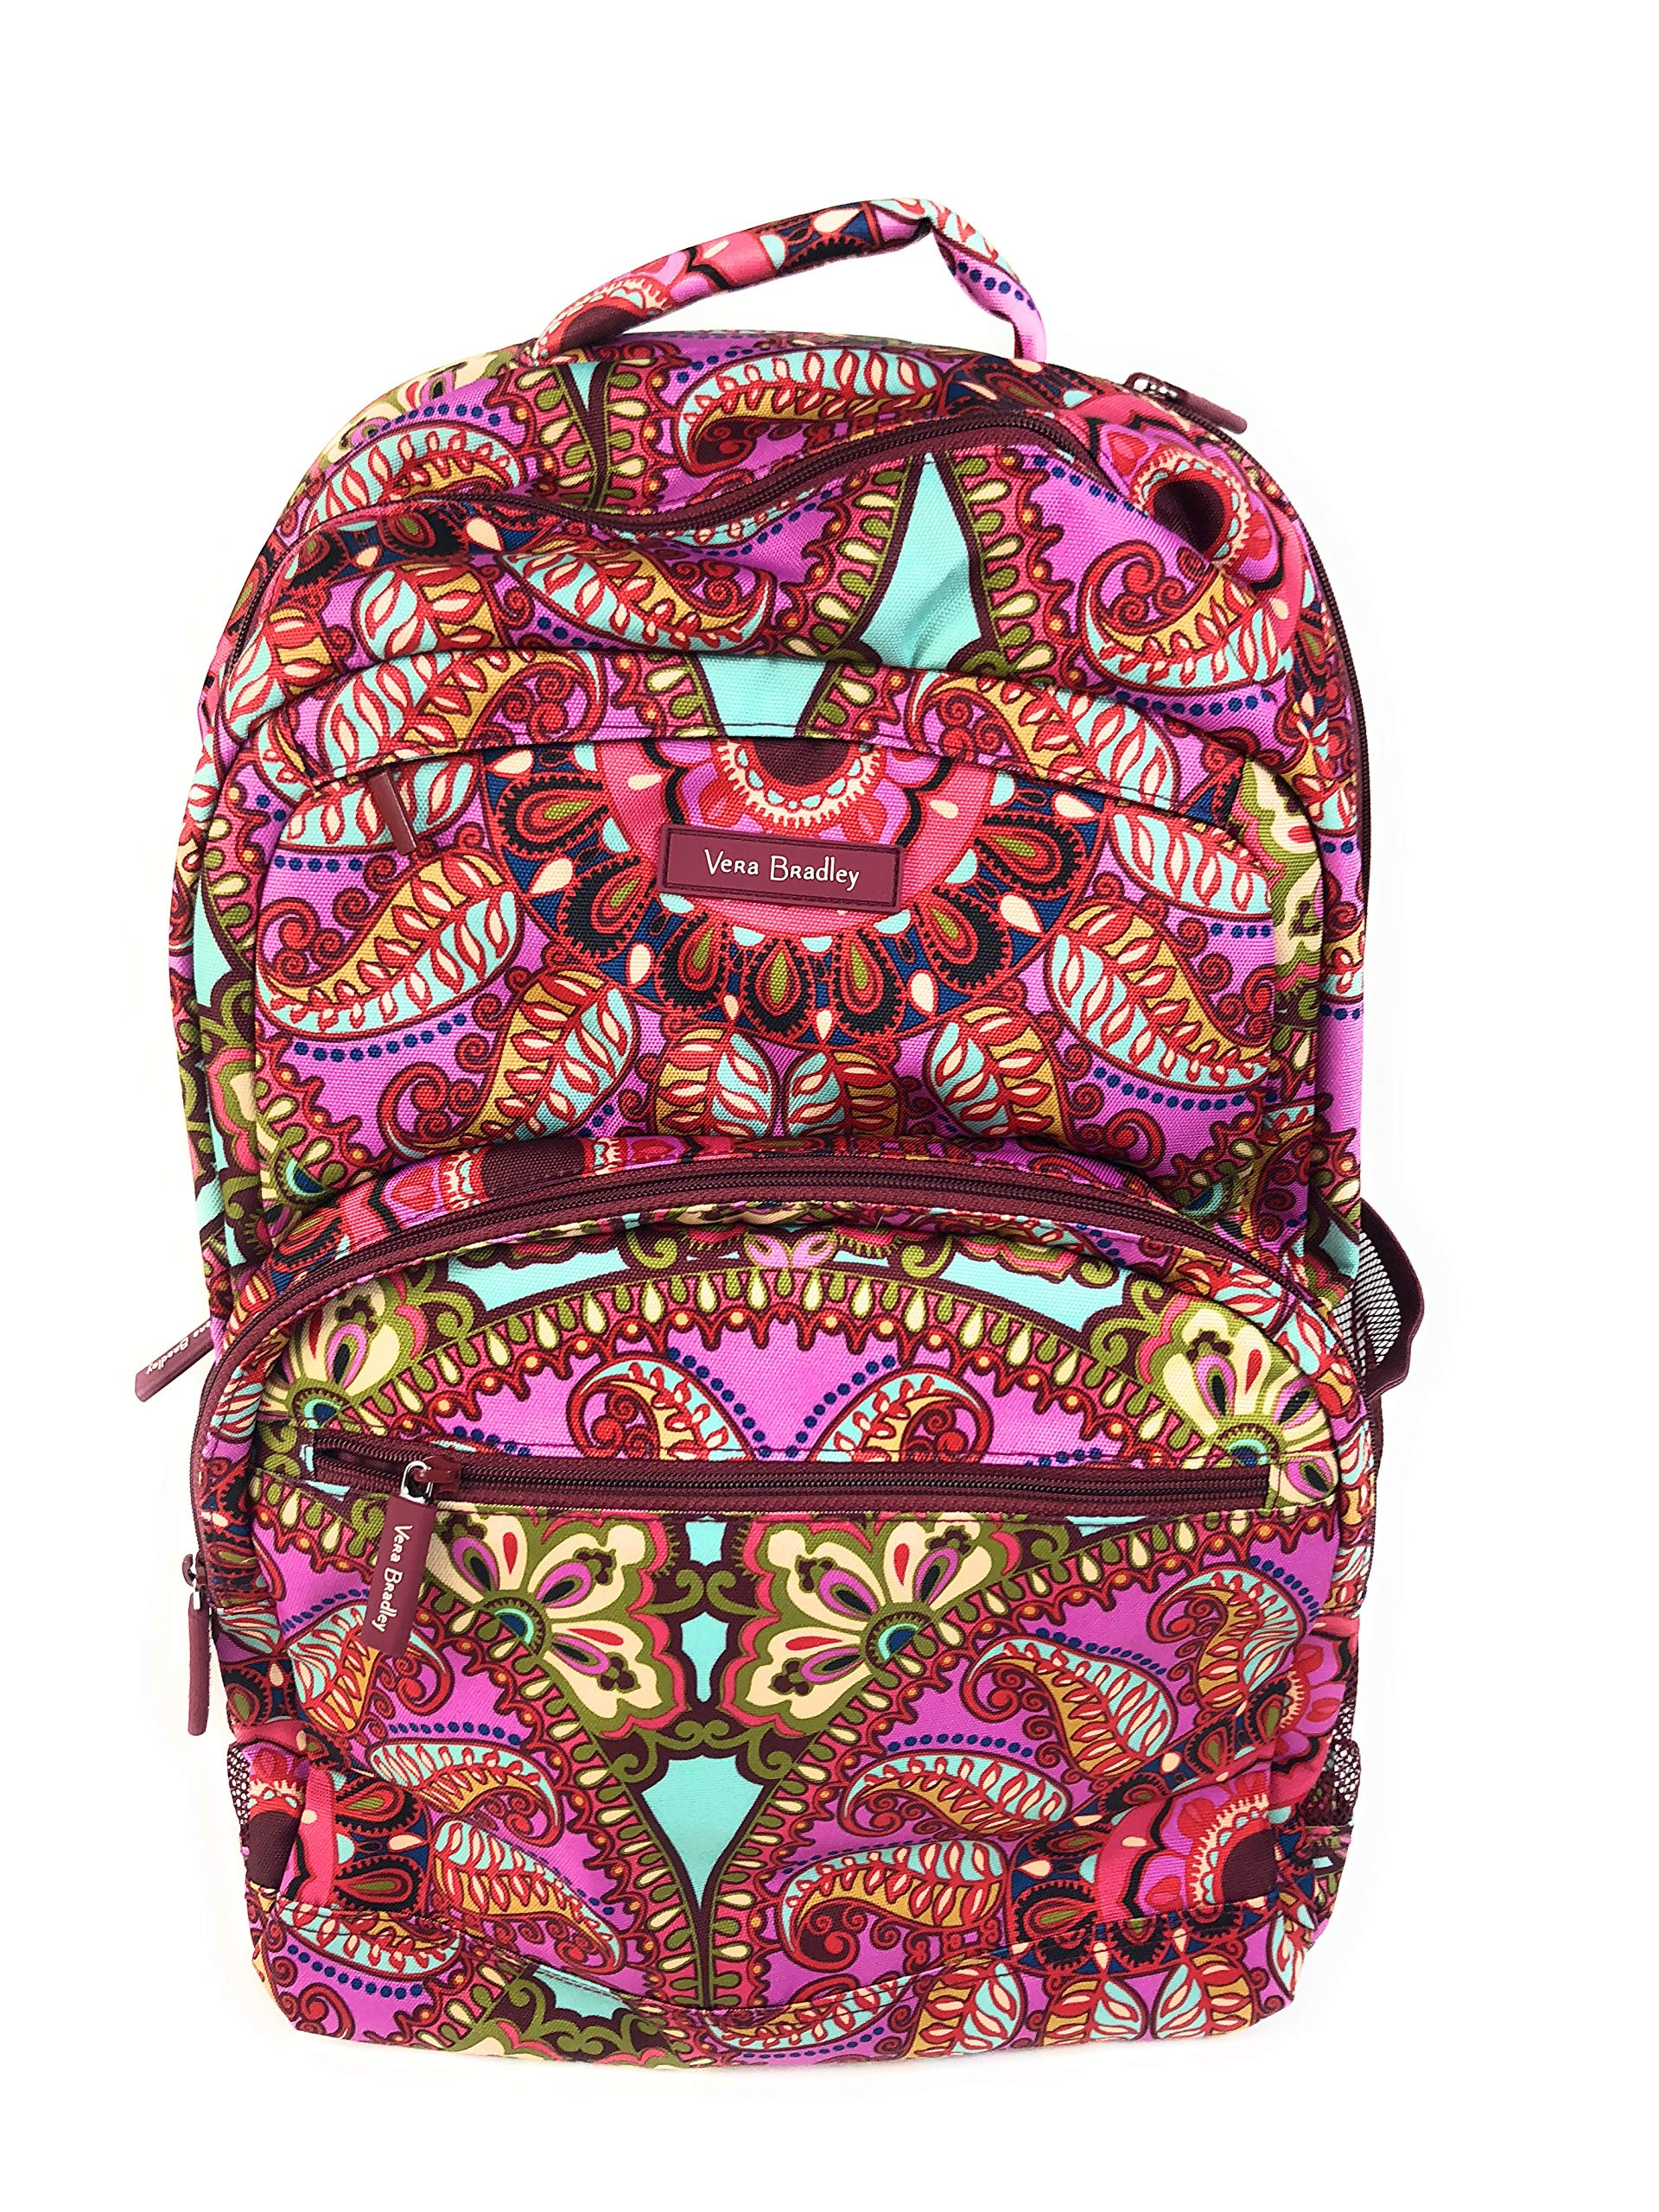 Vera Bradley Lighten Up Essential Large Backpack Resort Medallion by Vera Bradley